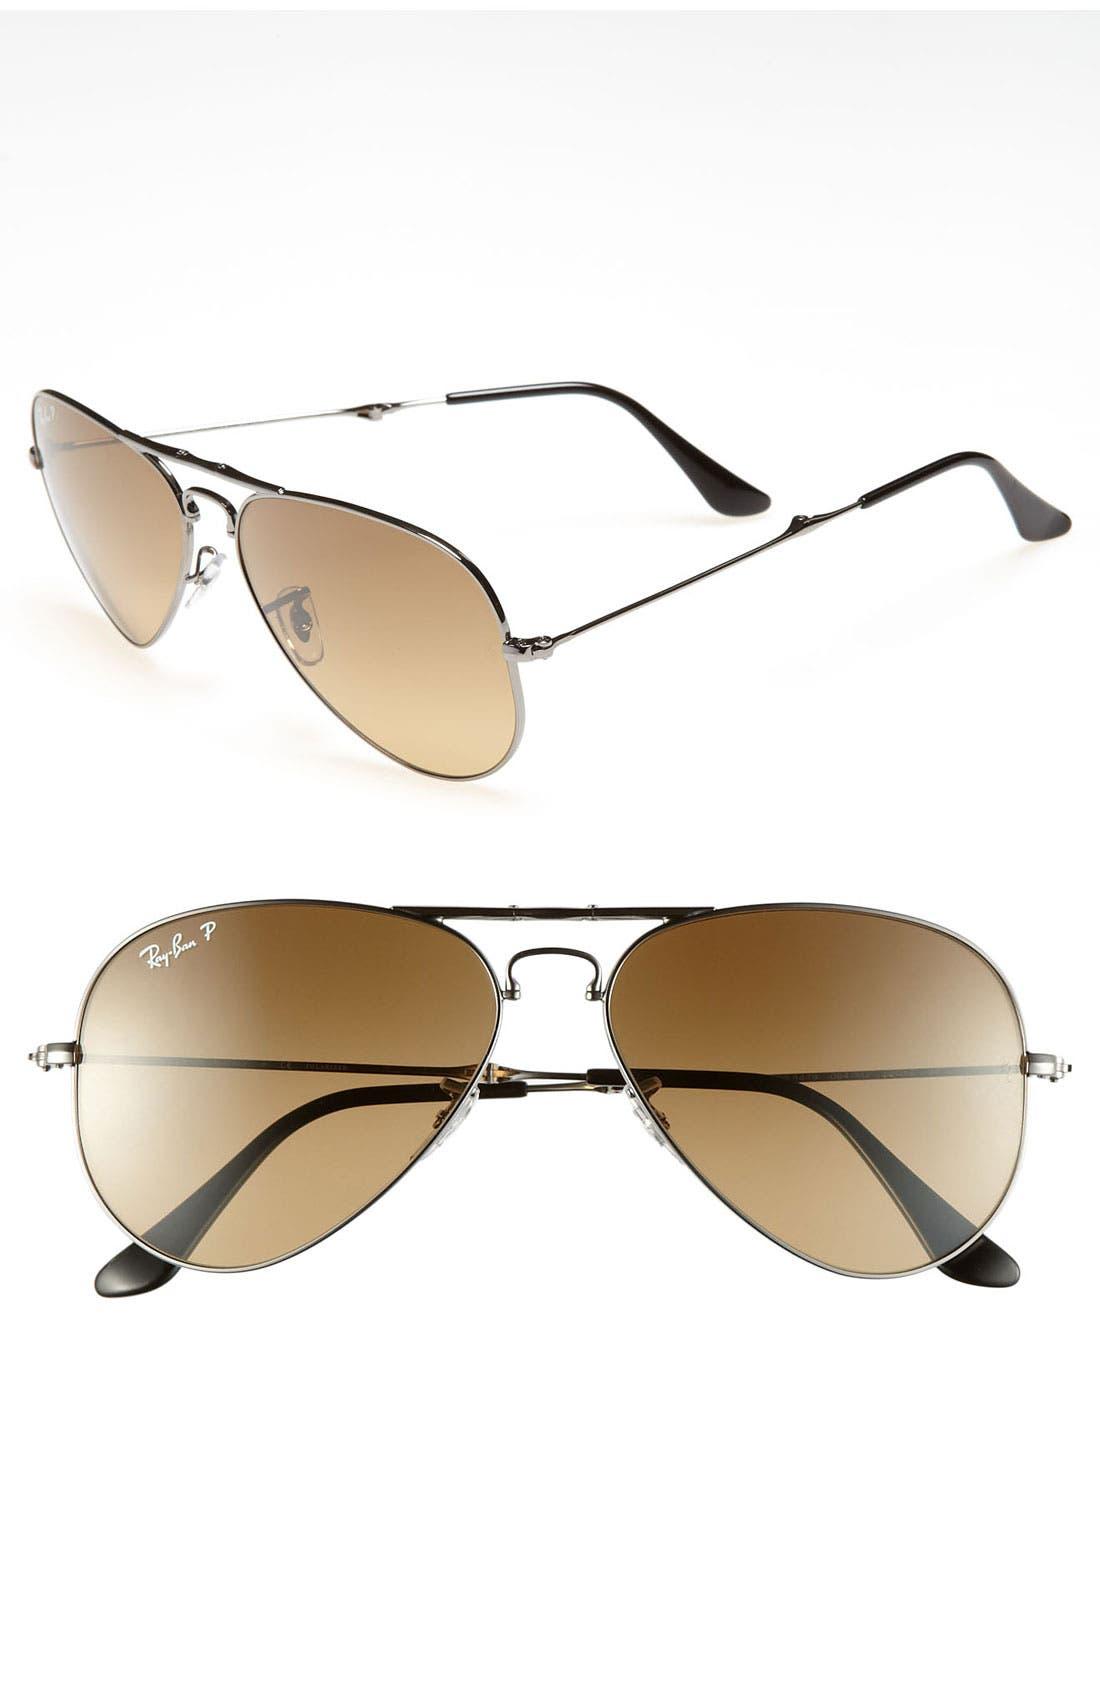 Alternate Image 1 Selected - Ray-Ban 58mm Polarized Folding Aviator Sunglasses